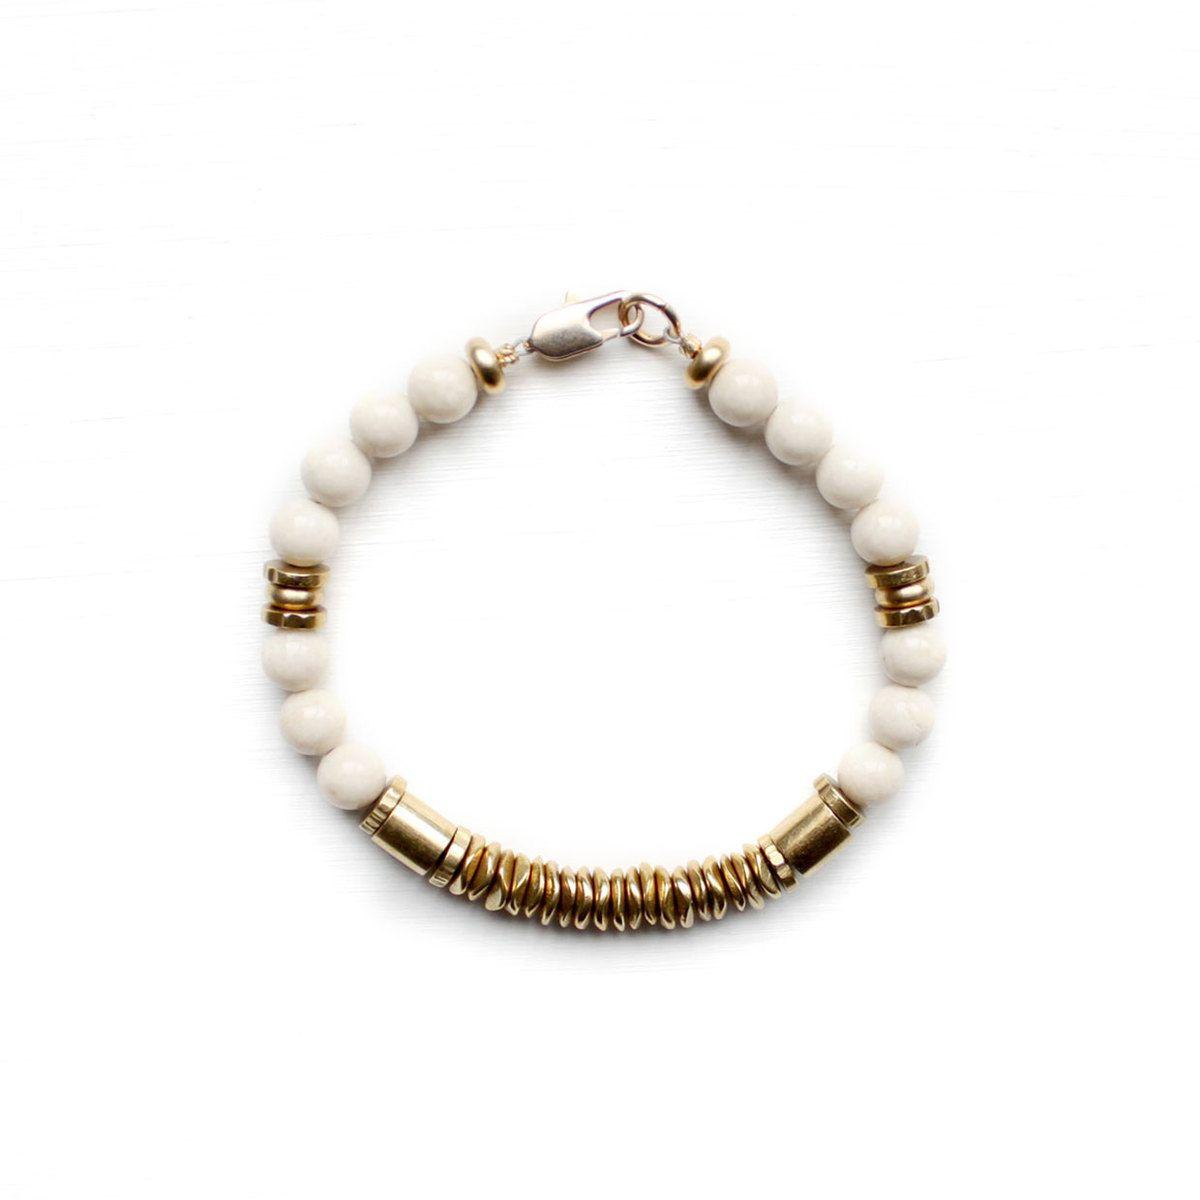 Riverstone Brass Bracelet by Kathryn Blackmore